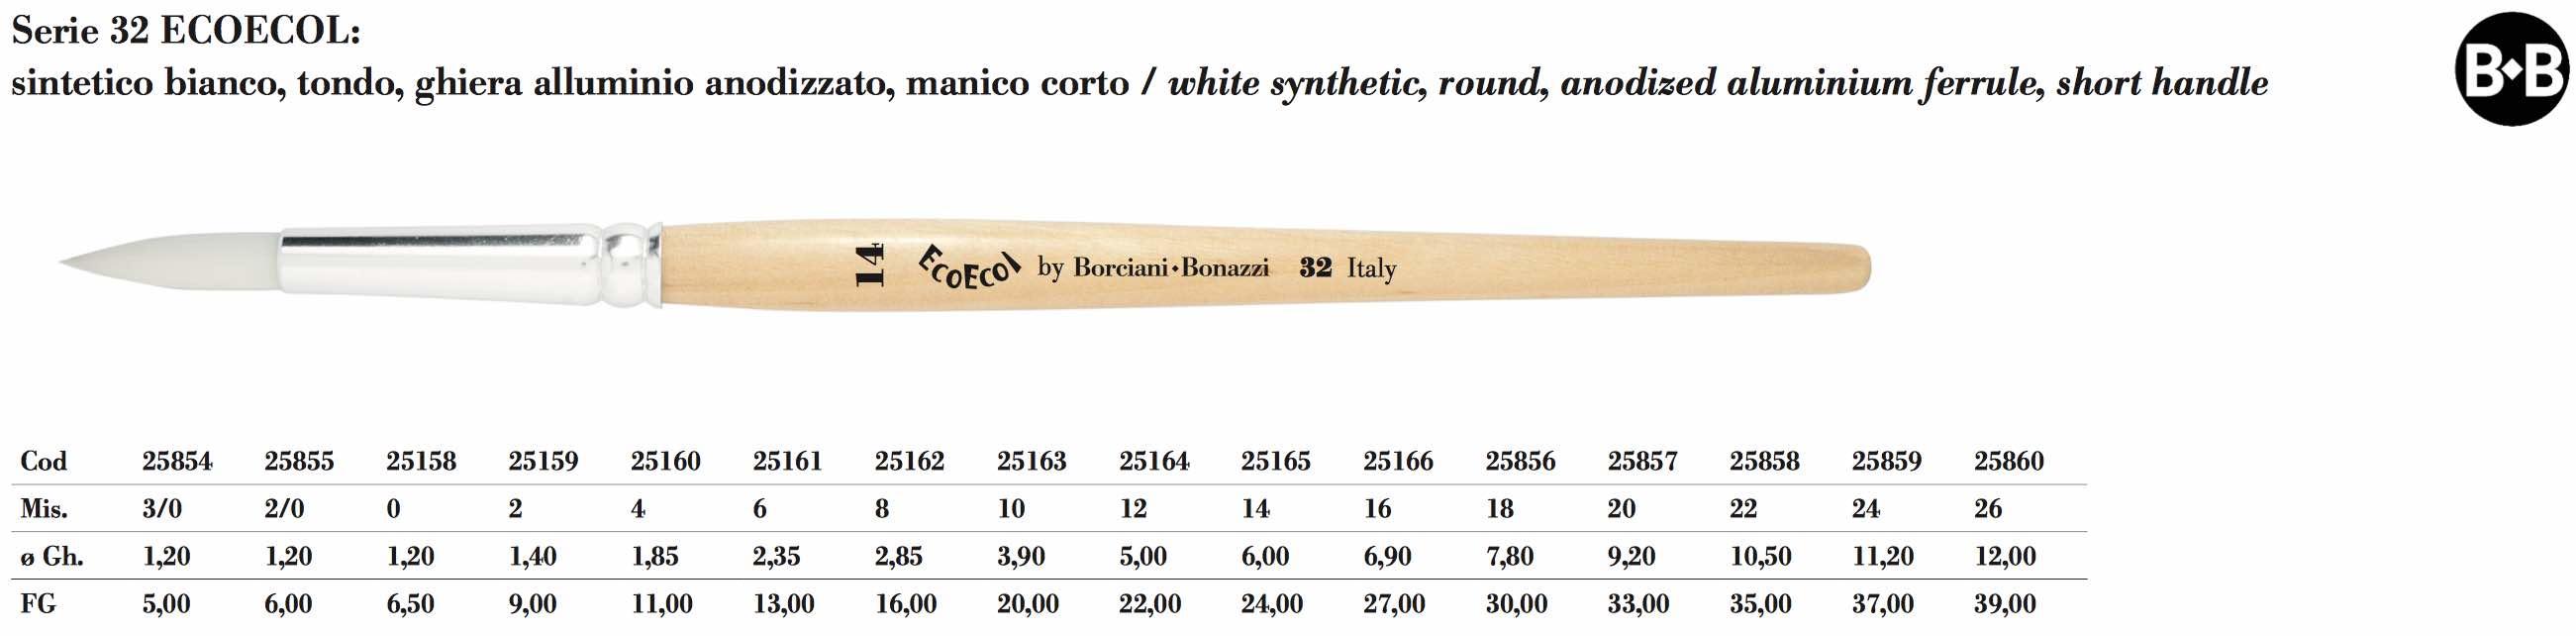 Borciani e Bonazzi 32 series